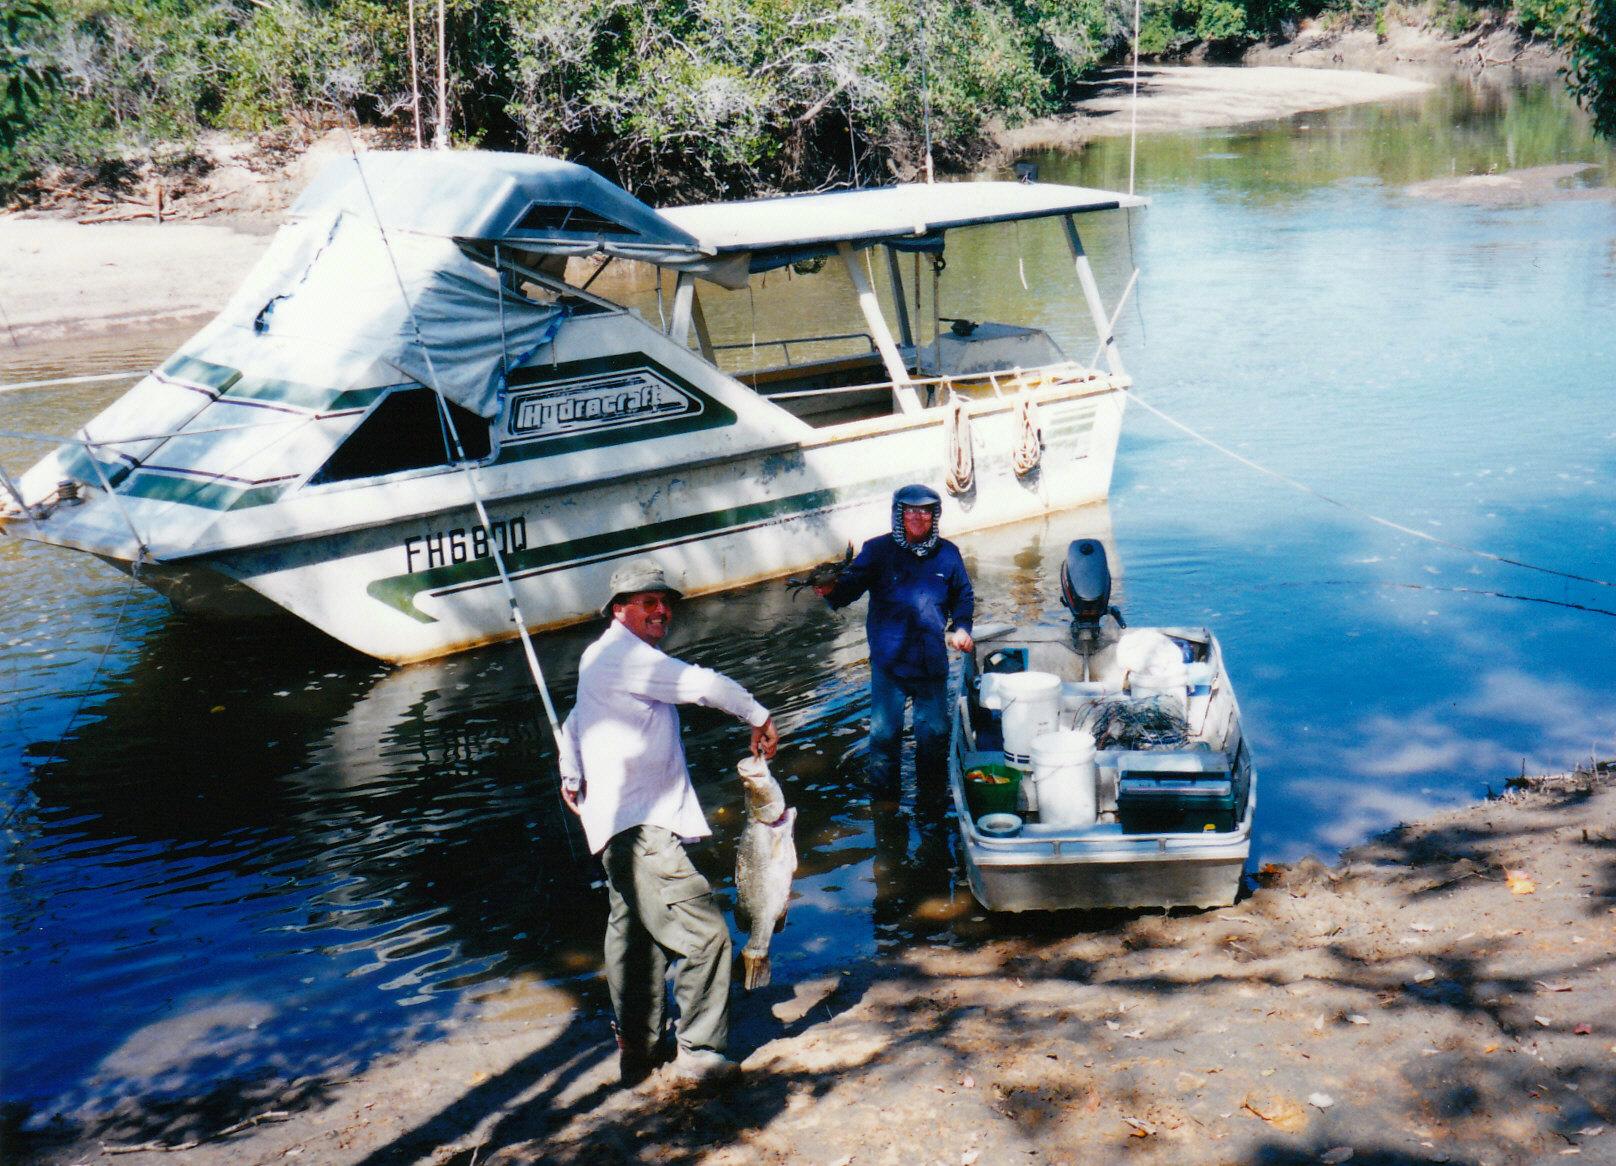 07-16-1998 01 des john barra mud crab.jpg